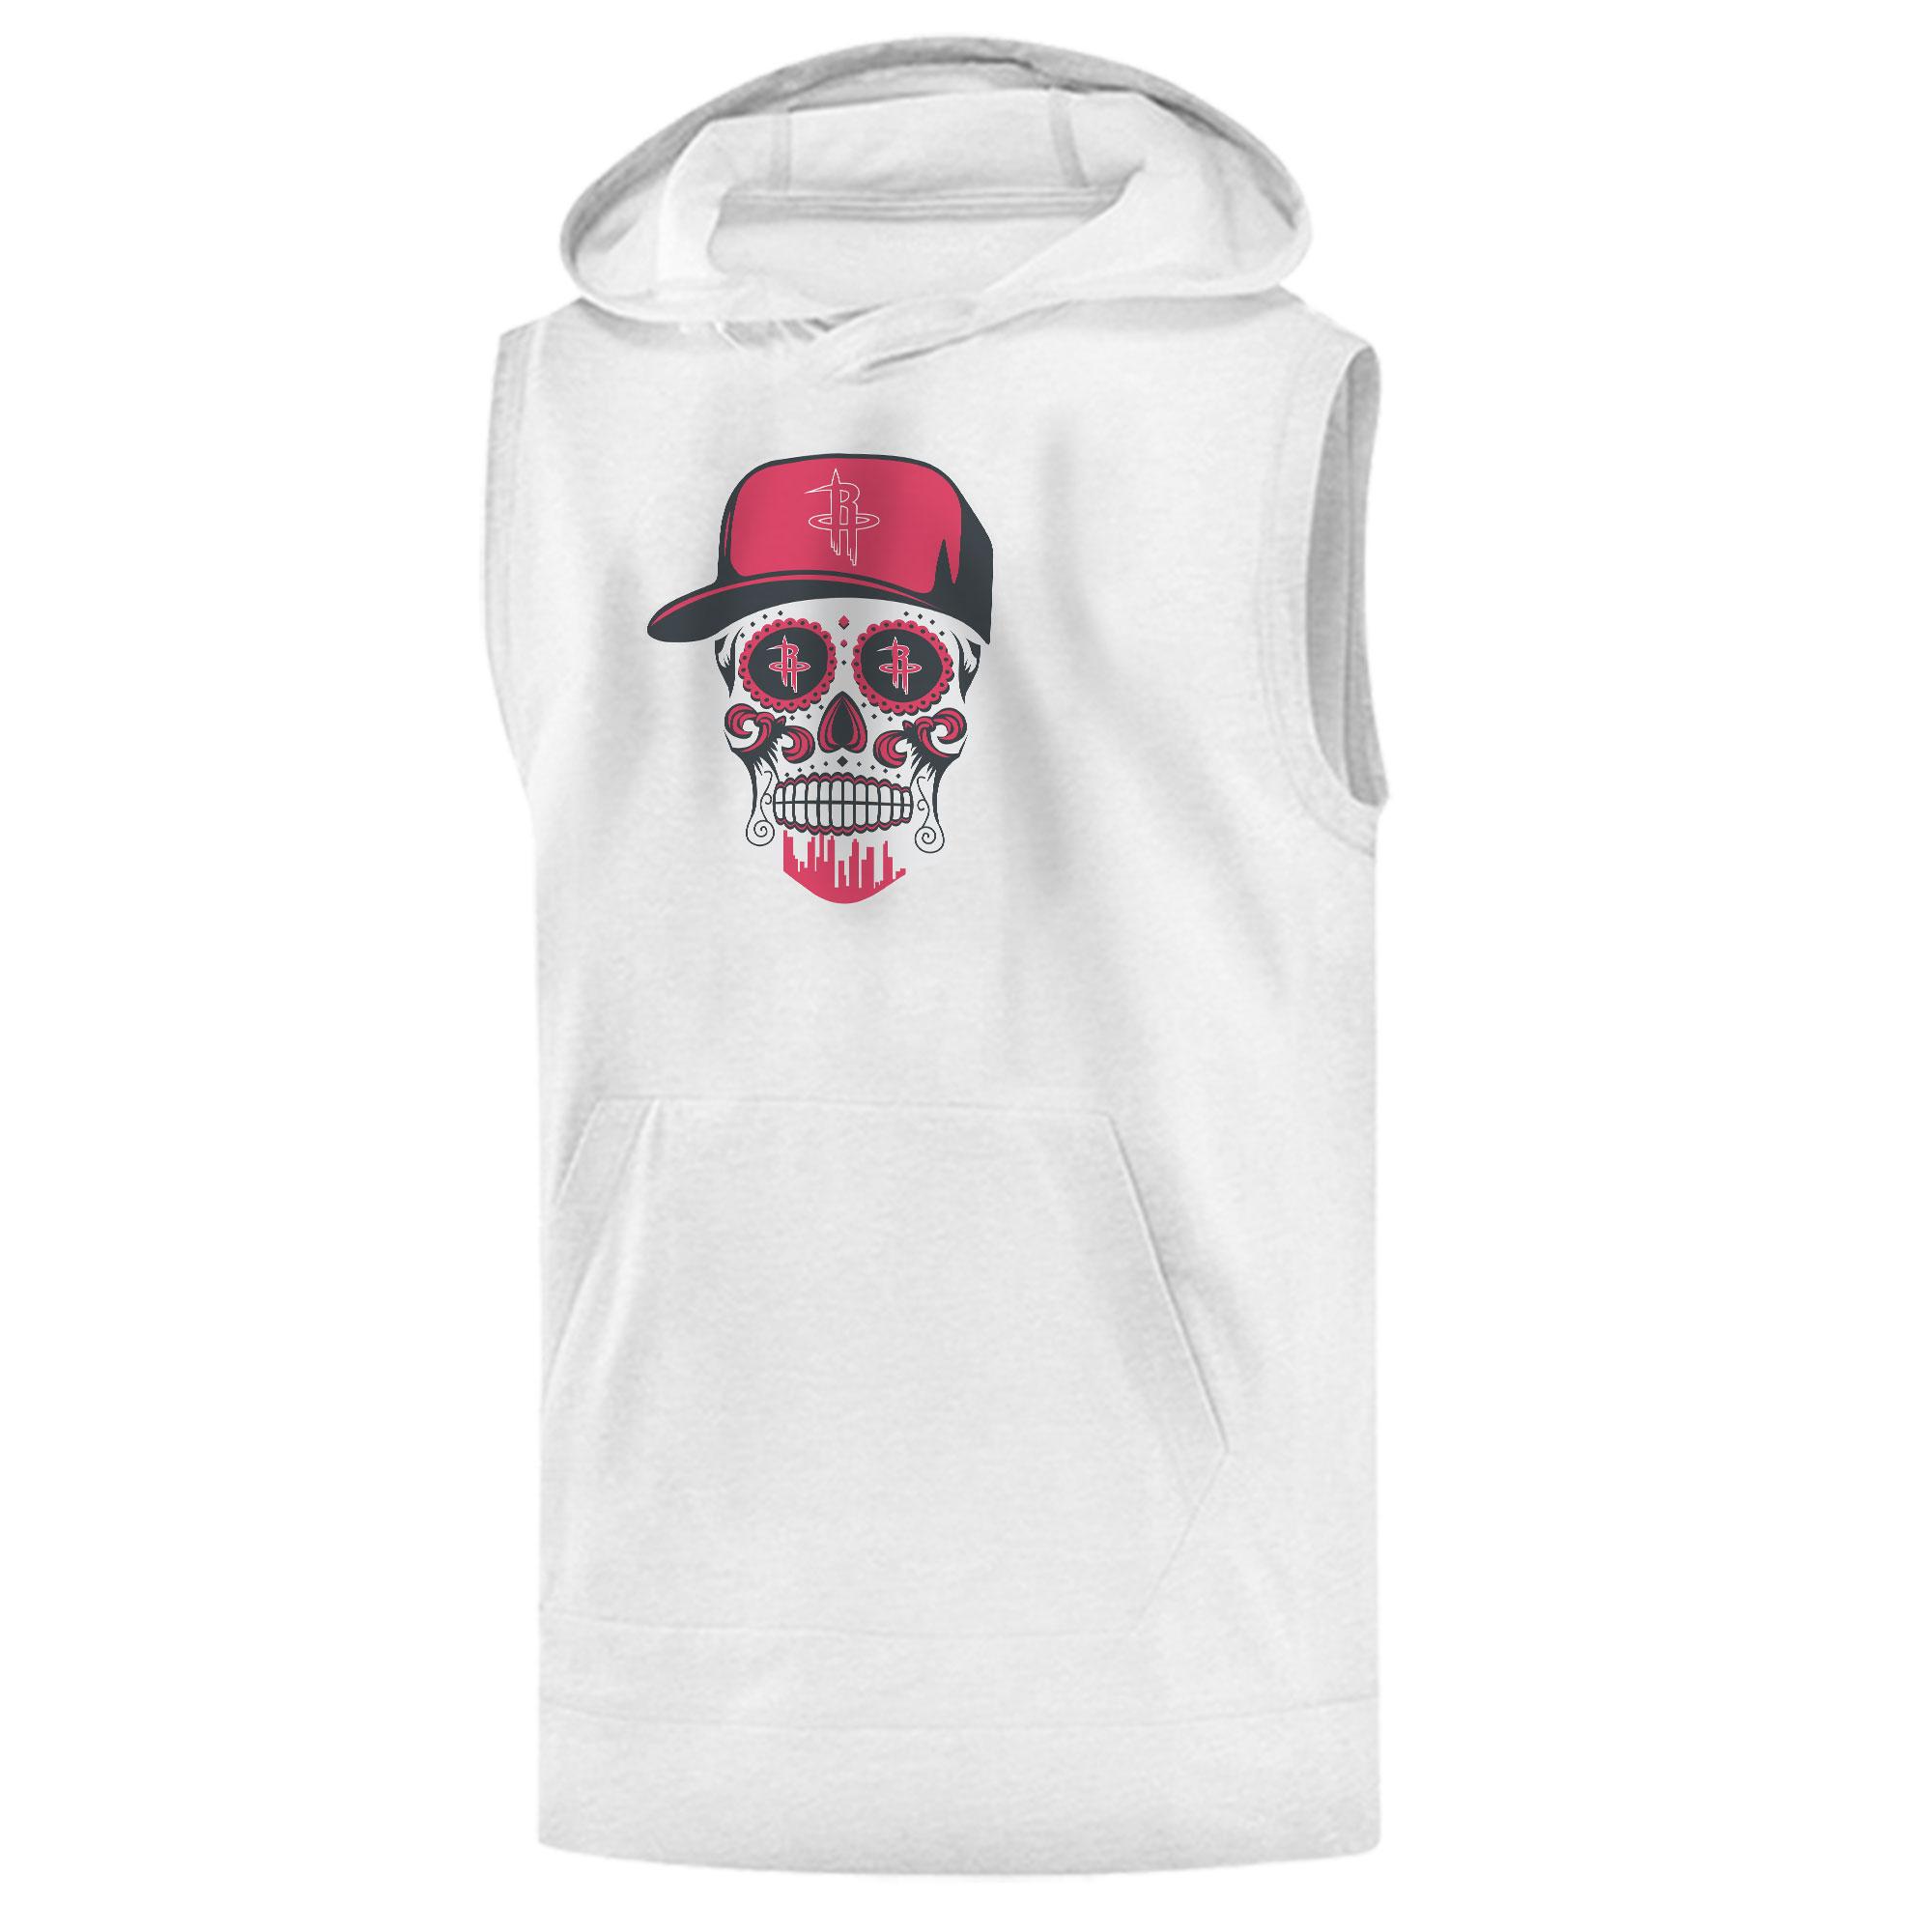 Rockets Skull Sleeveless (KLS-WHT-NP-453-NBA-HOU-SKULL)